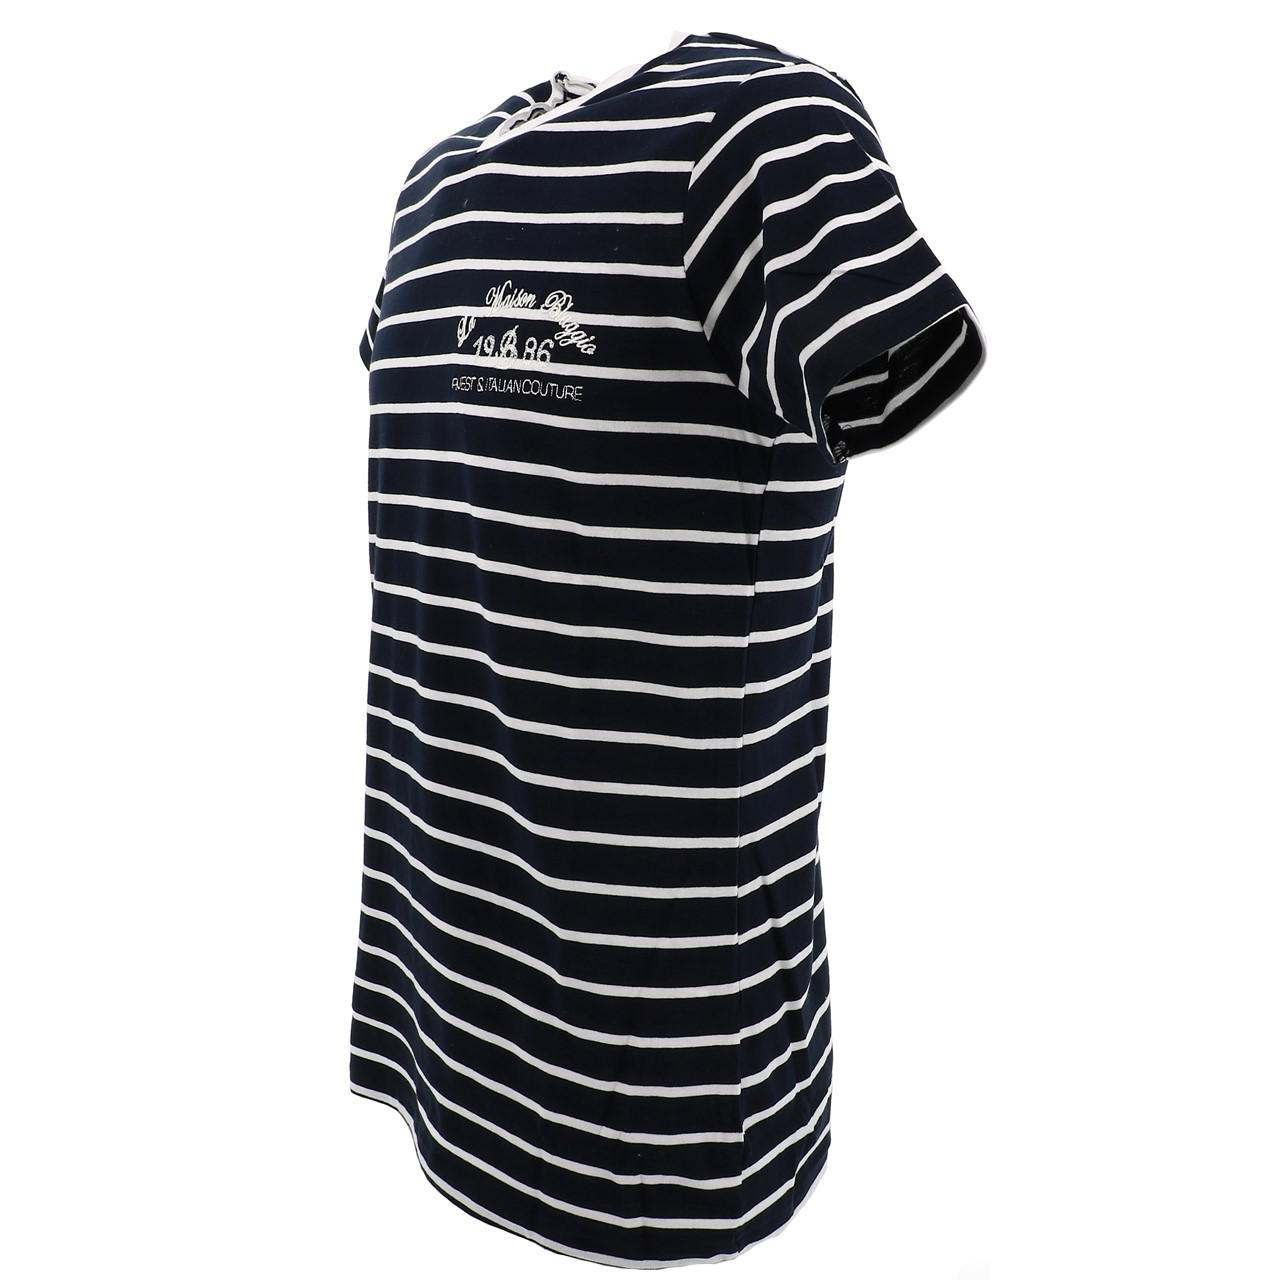 Short-Sleeve-T-Shirt-La-Maison-Blaggio-Mavili-Navy-Wht-Mc-Tee-Blue-27335 thumbnail 4